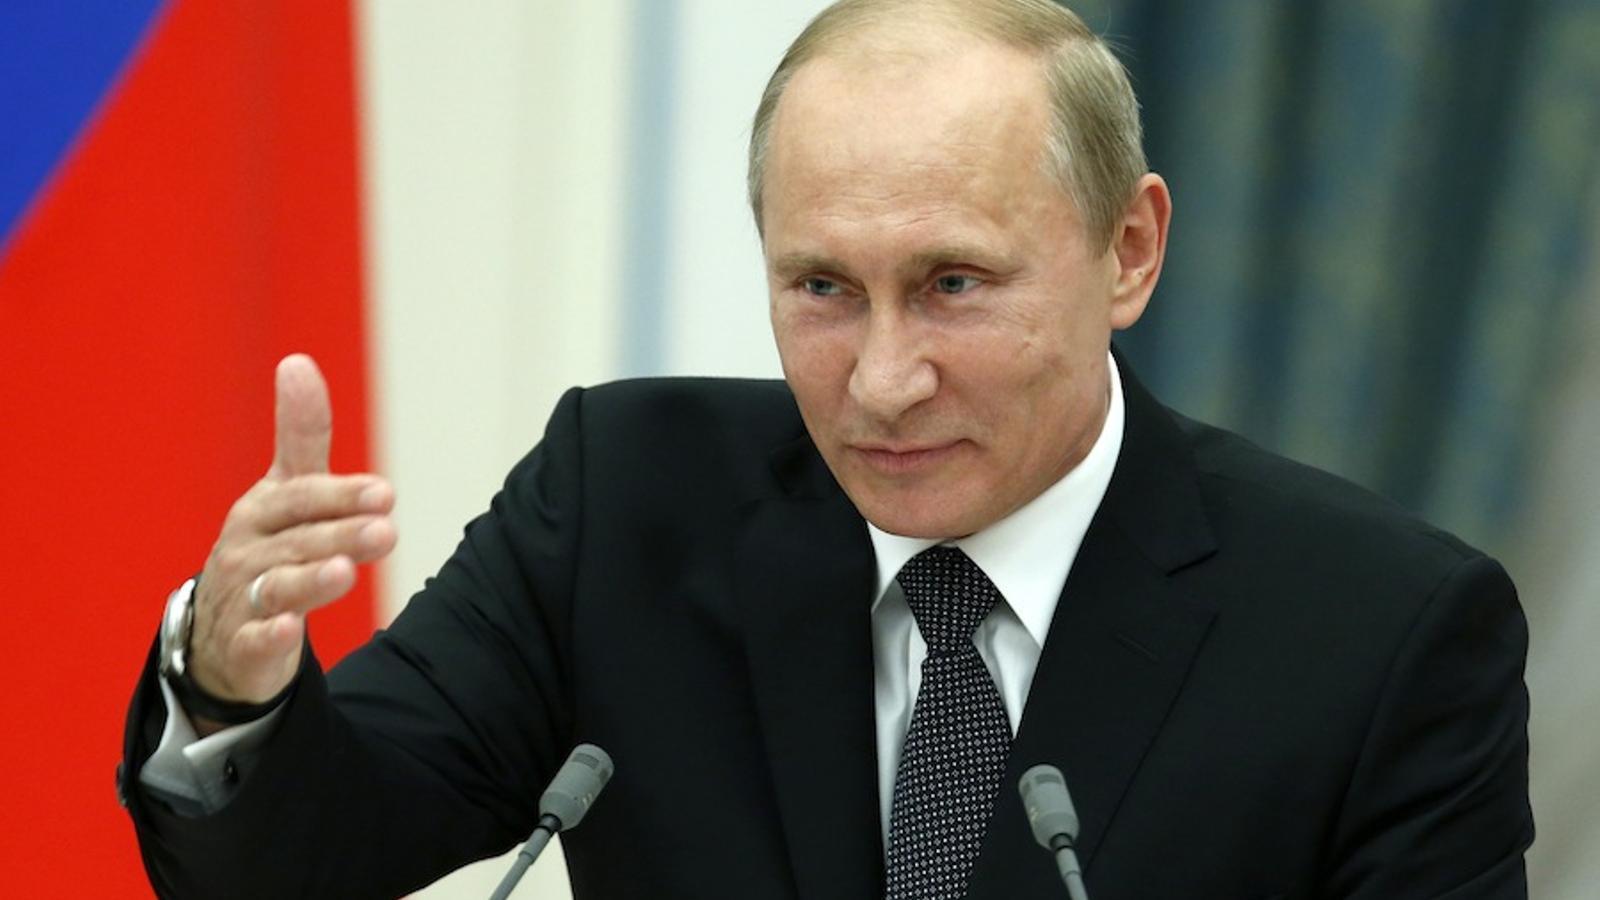 El president rus, Vladimir Putin, aquest dimecres. Reuters